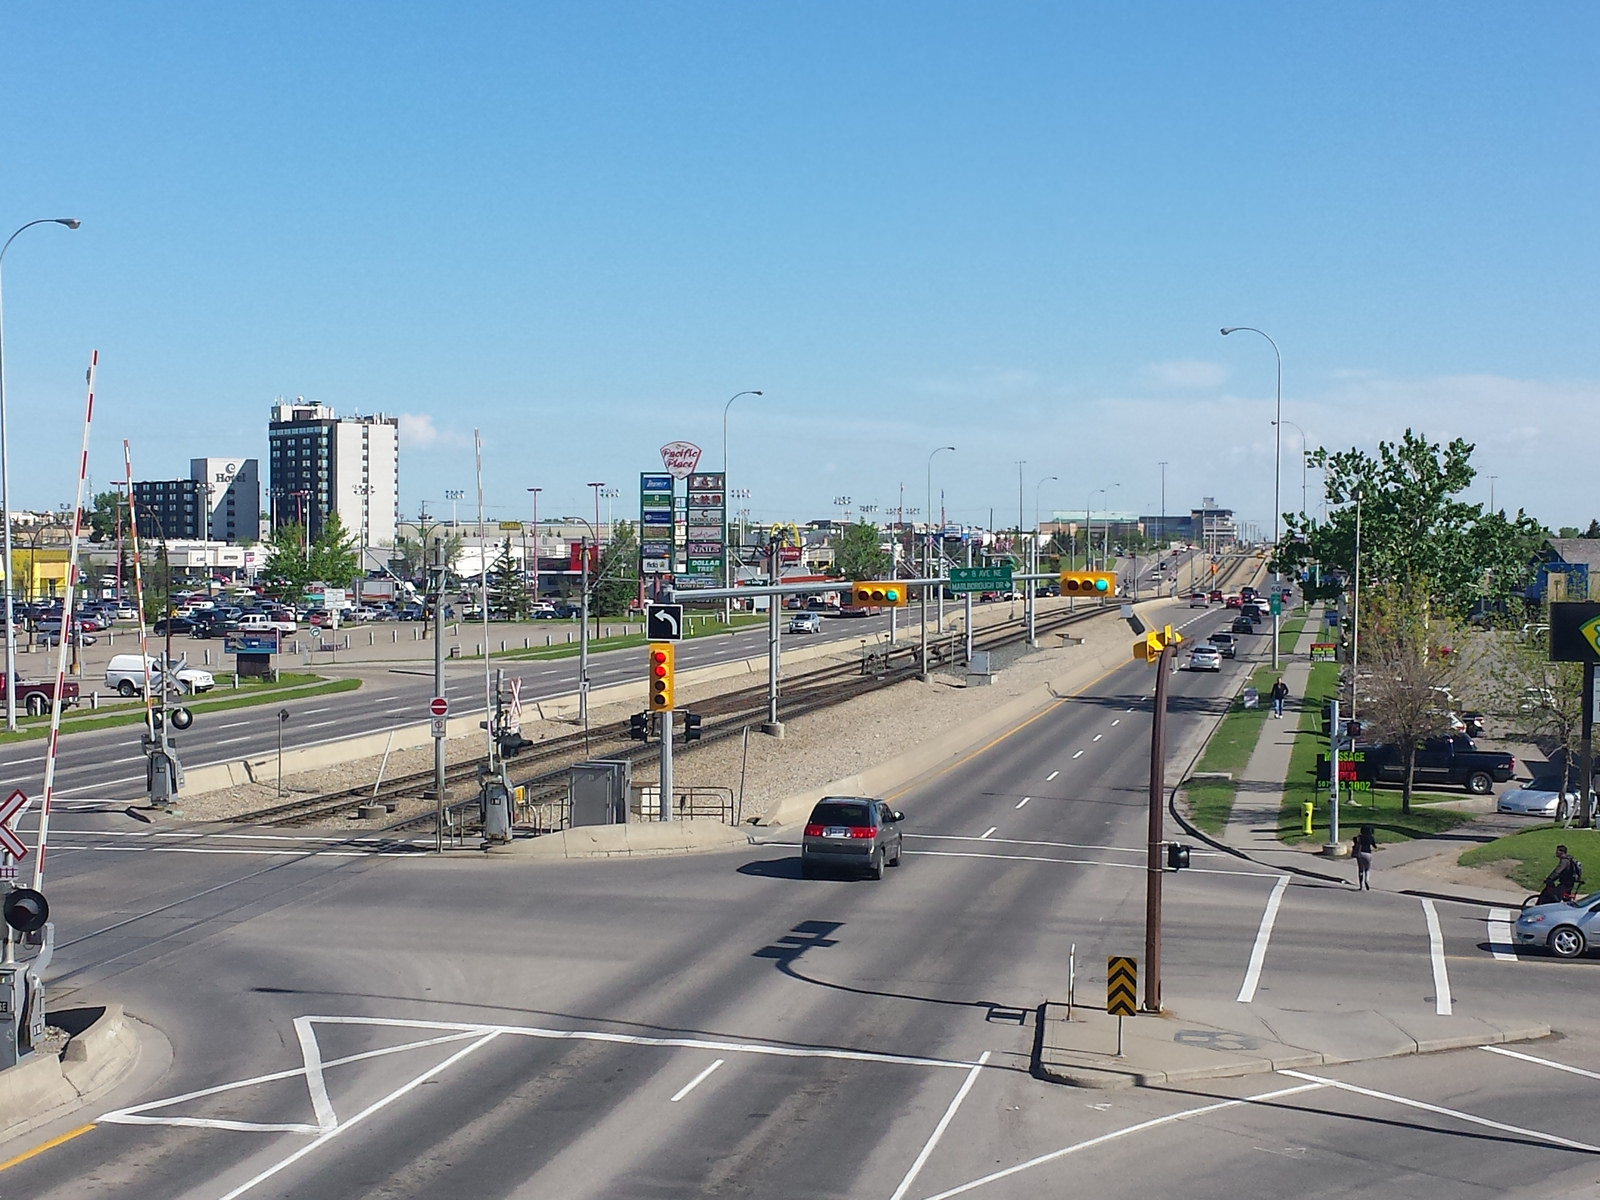 Calgary LRT on 36 St NE - Photo credit: Ryan Harder, Flickr